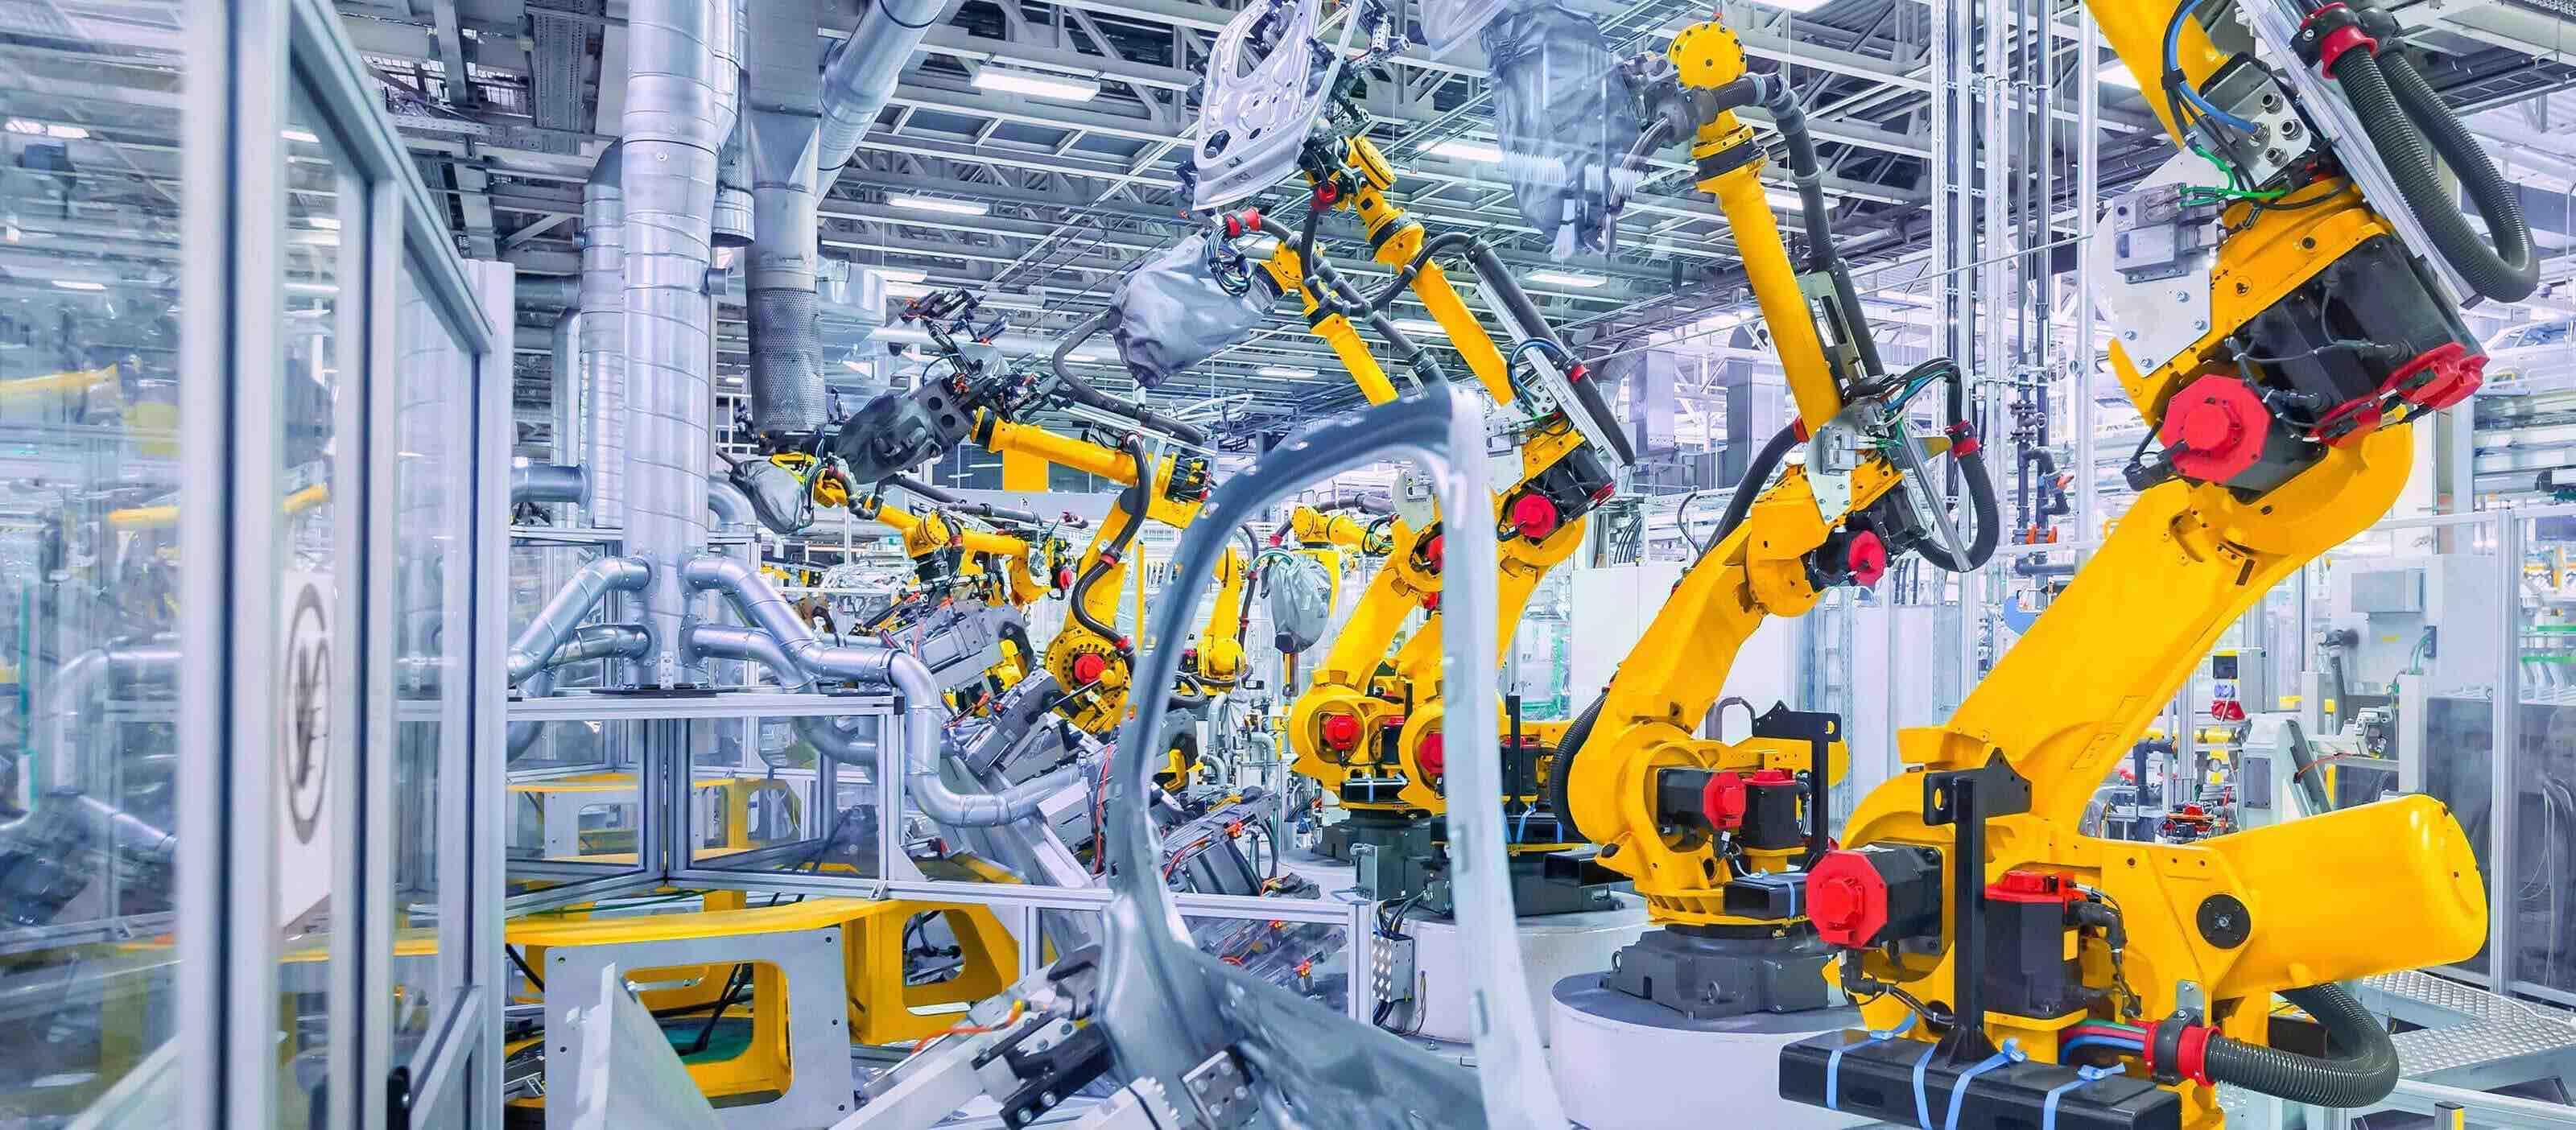 header-solution-provider-automotive-plant-101709371-3200x1404